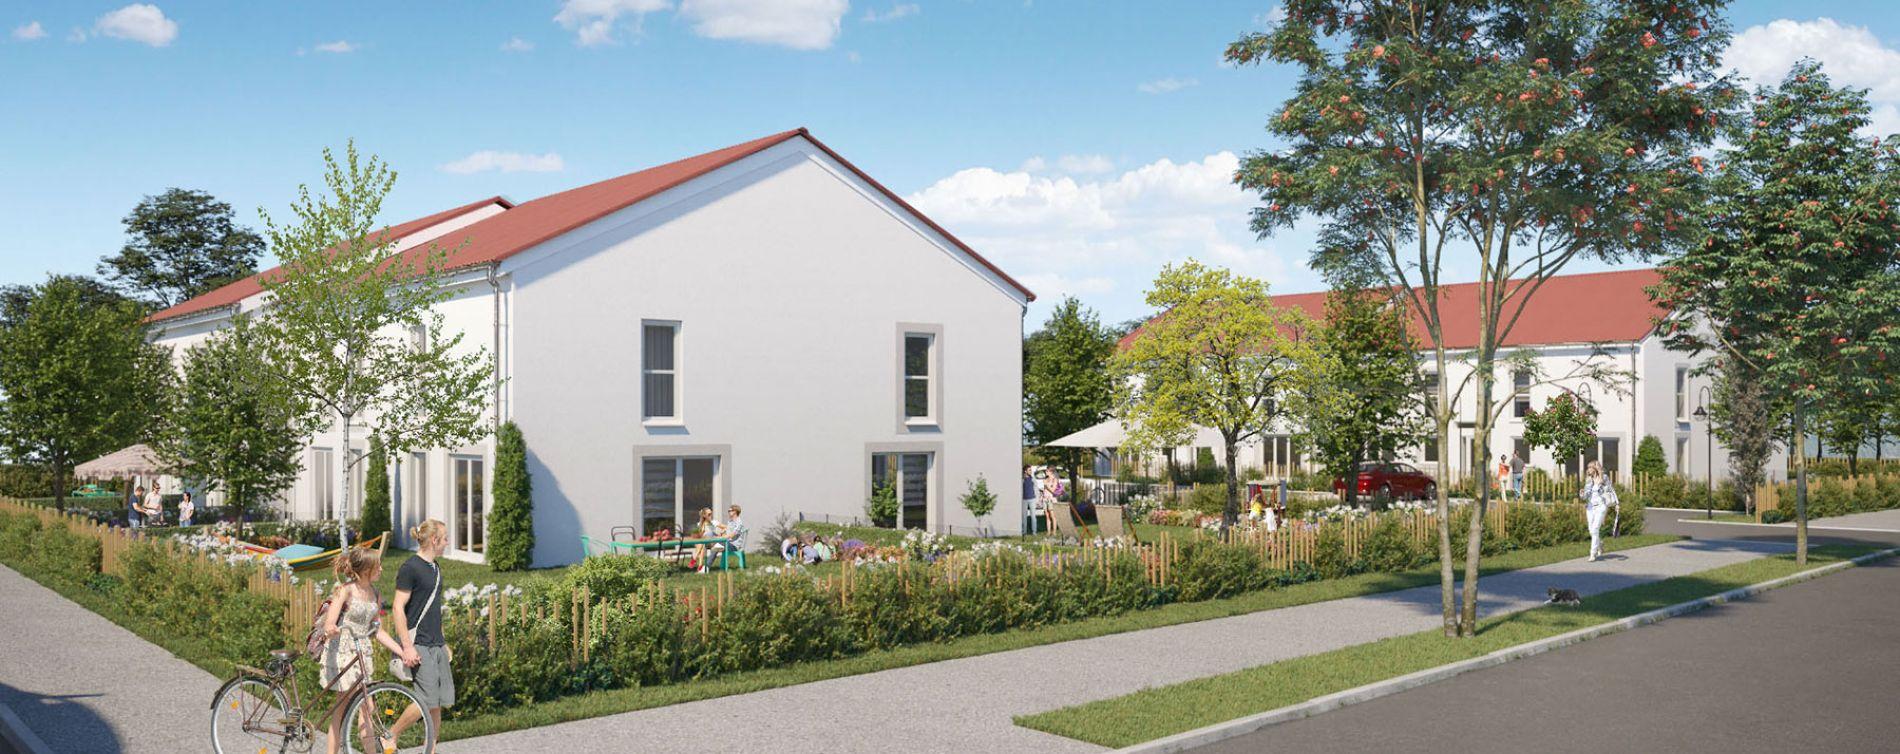 Neuves-Maisons : programme immobilier neuve « Horizons »